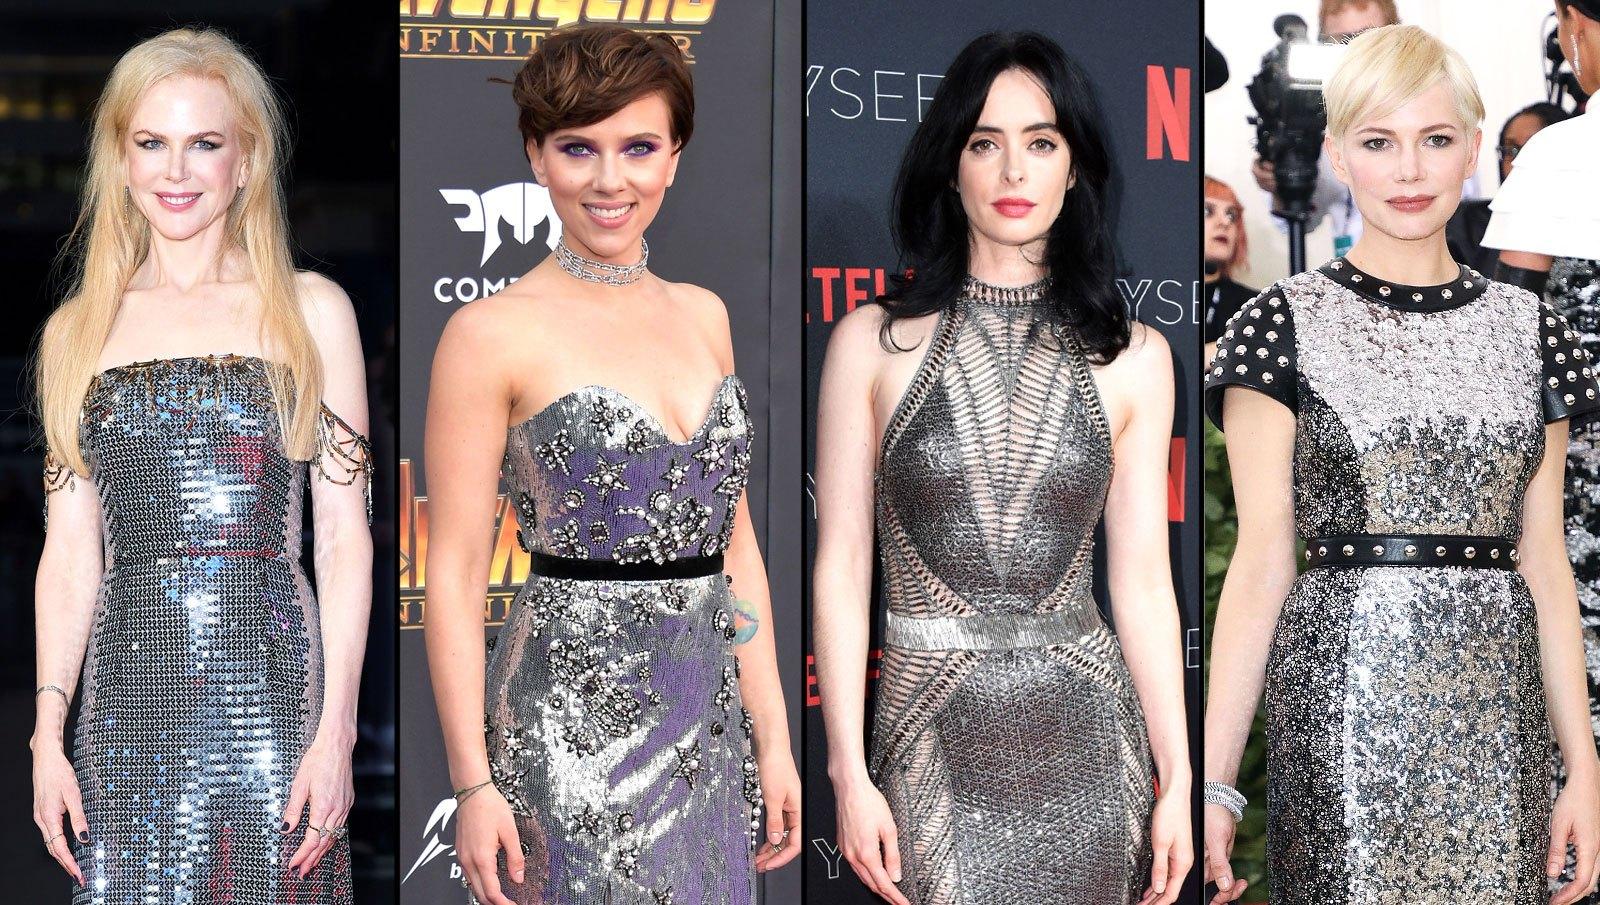 Nicole Kidman, Scarlett Johansson, Krysten Ritter, Michelle Williams